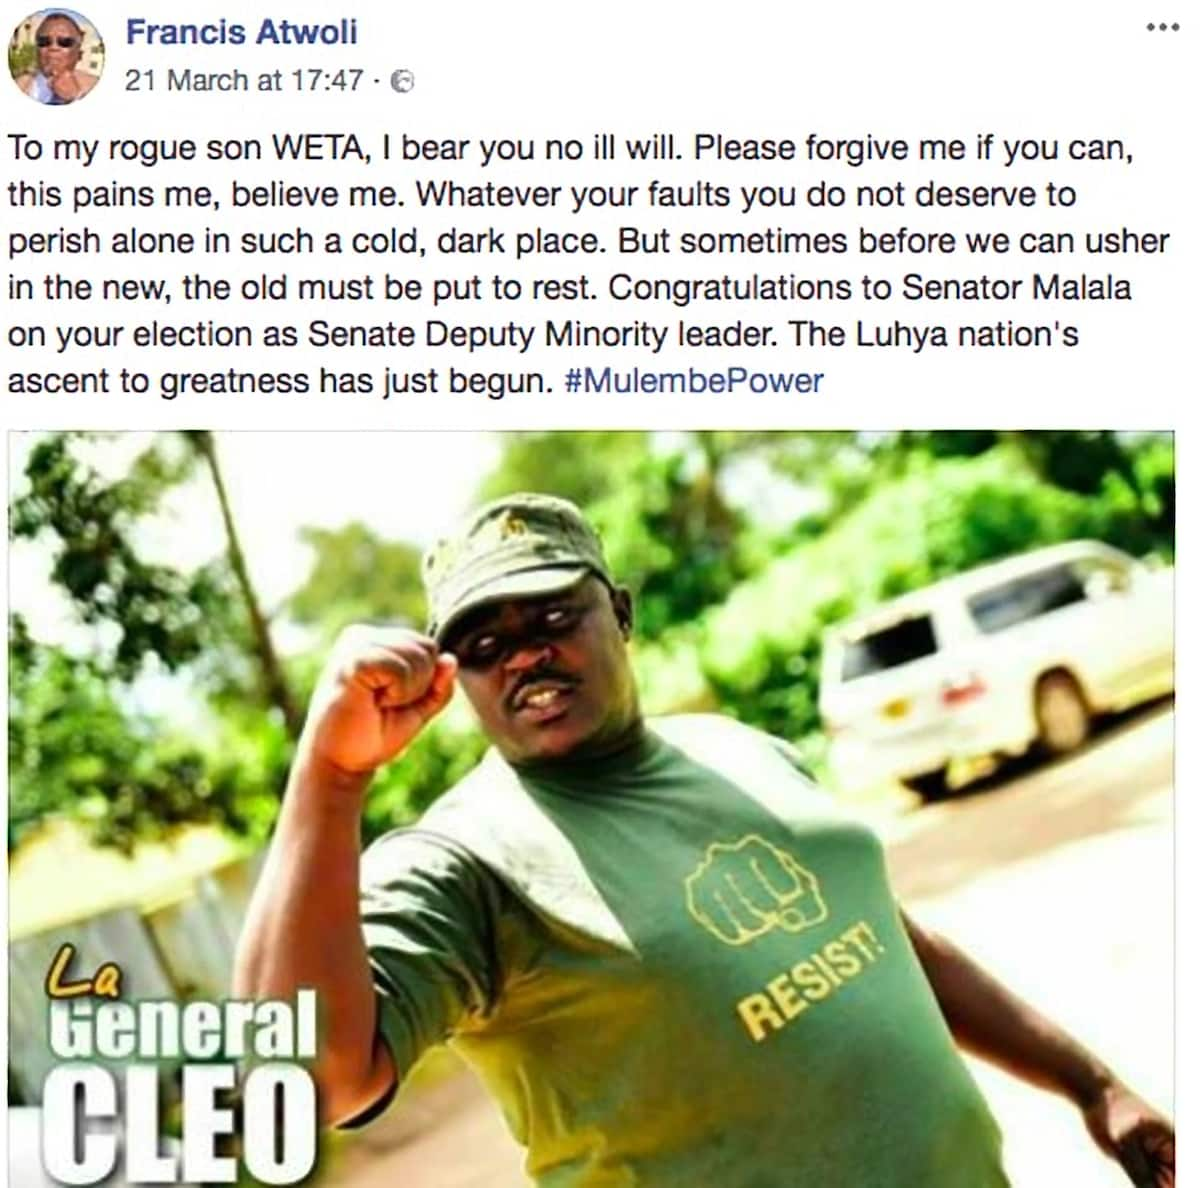 COTU boss Francis Atwoli denies belittling Moses Wetangula, blames fake Facebook page